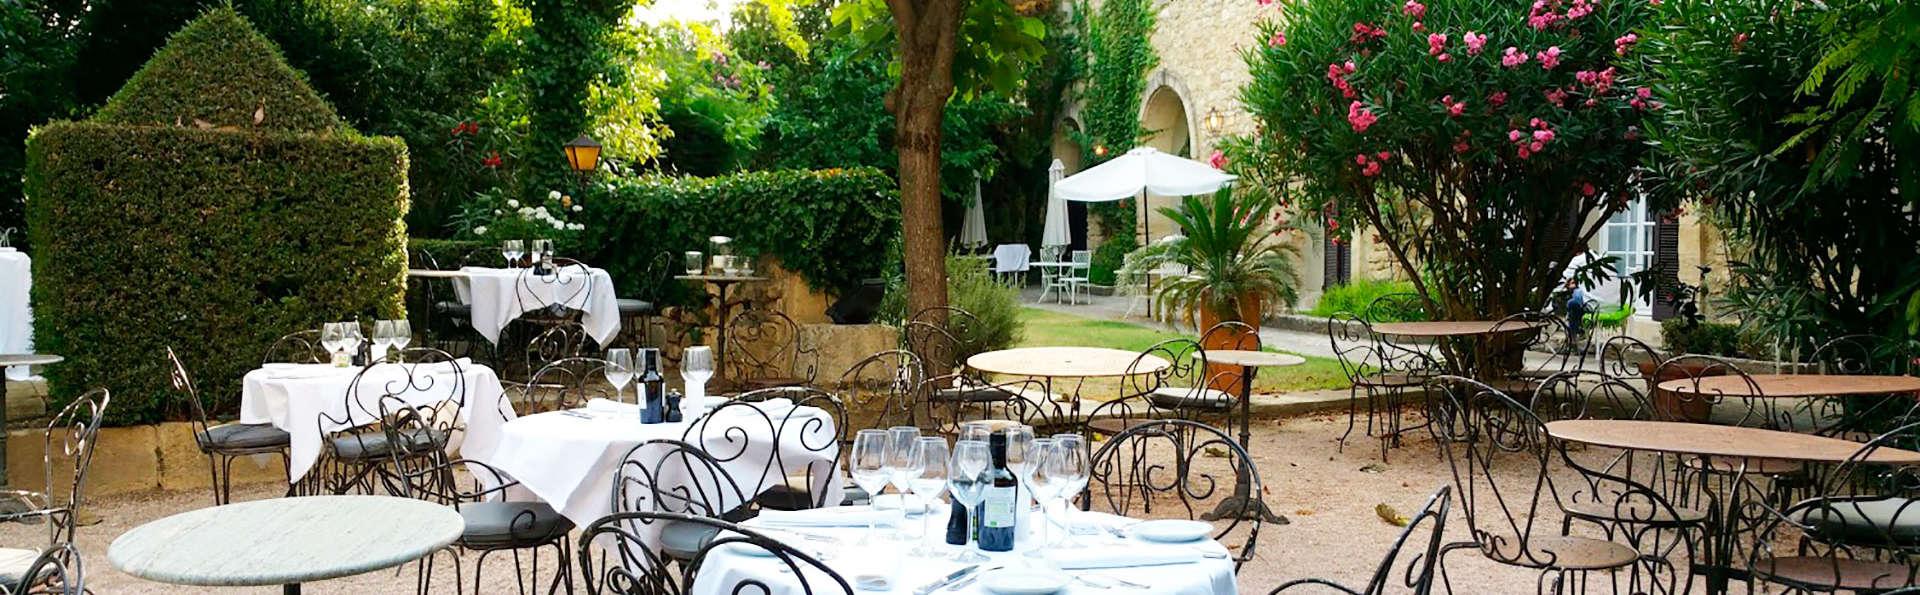 Week-end charme & gastronomie au coeur du Gard